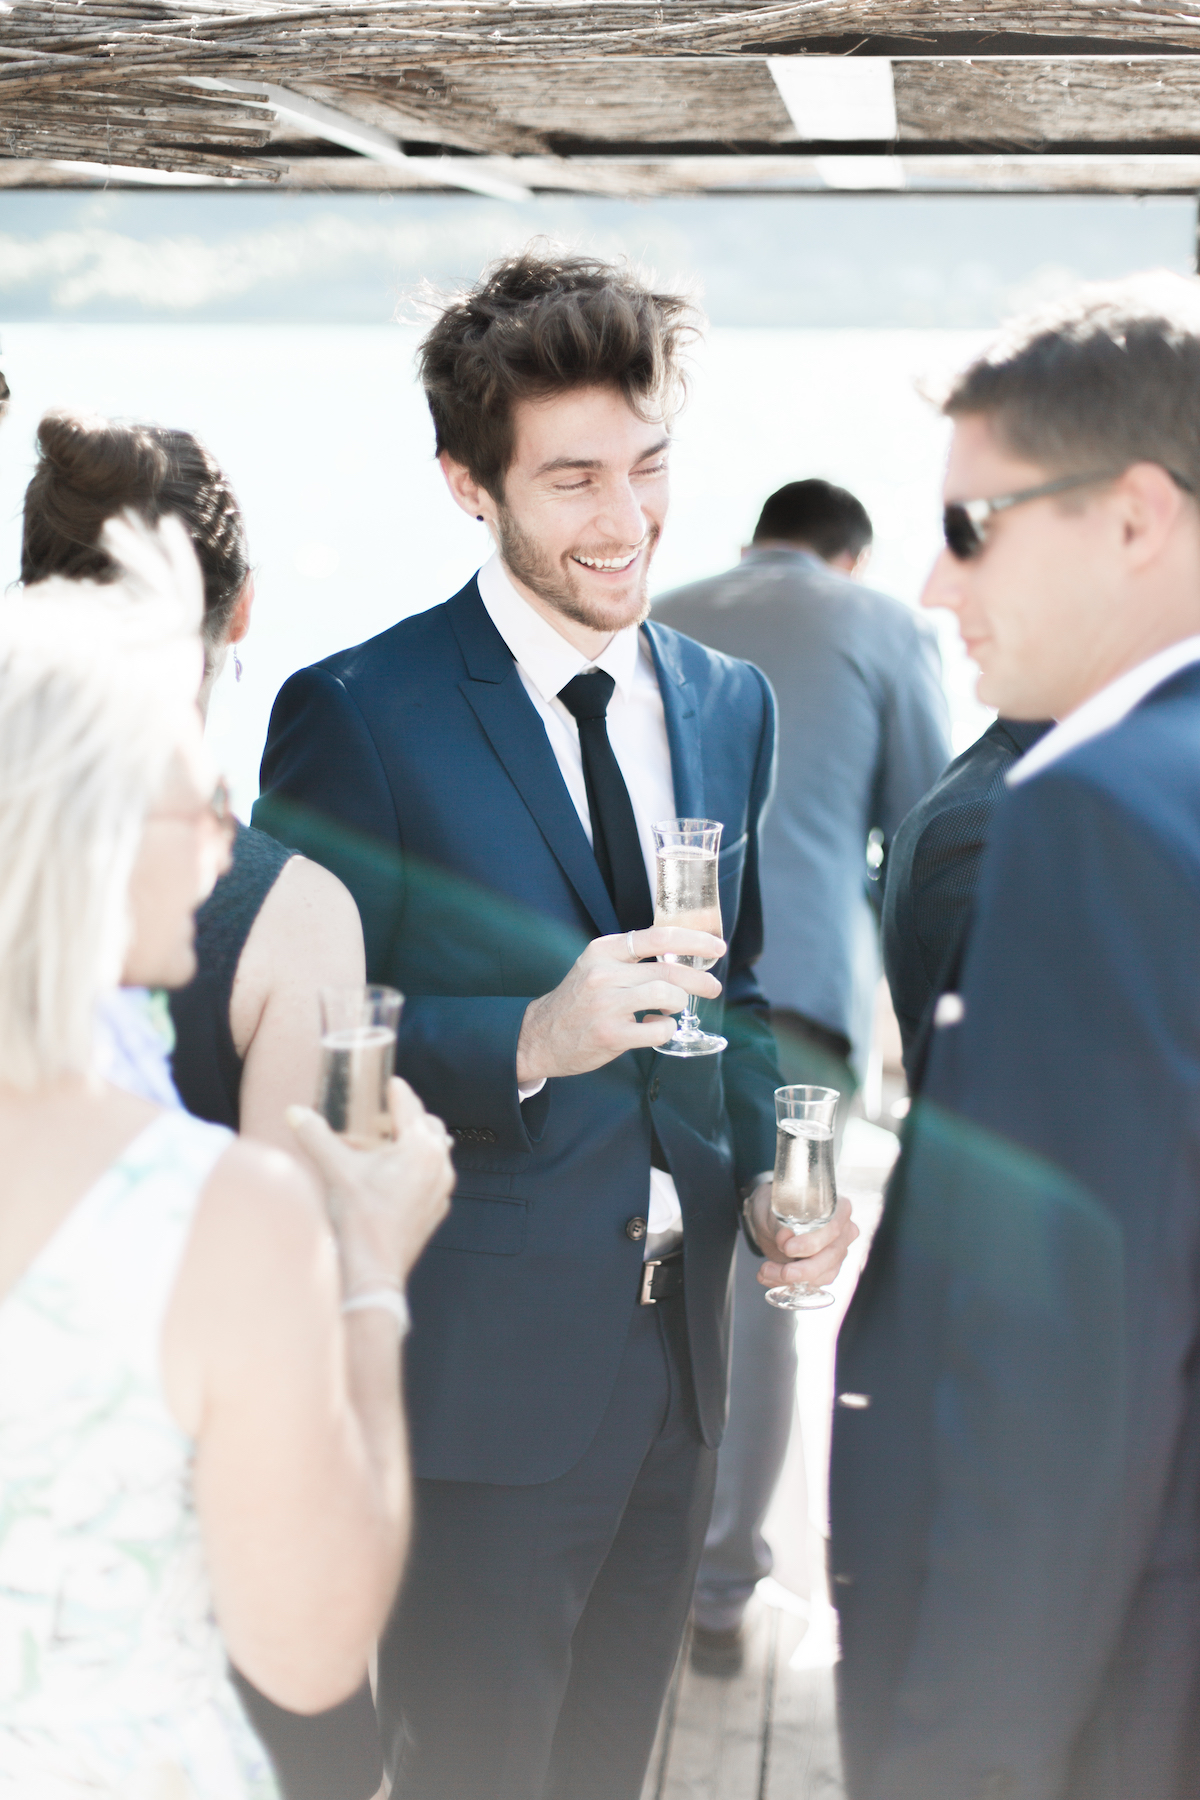 annecy-wedding-photos-156.jpg